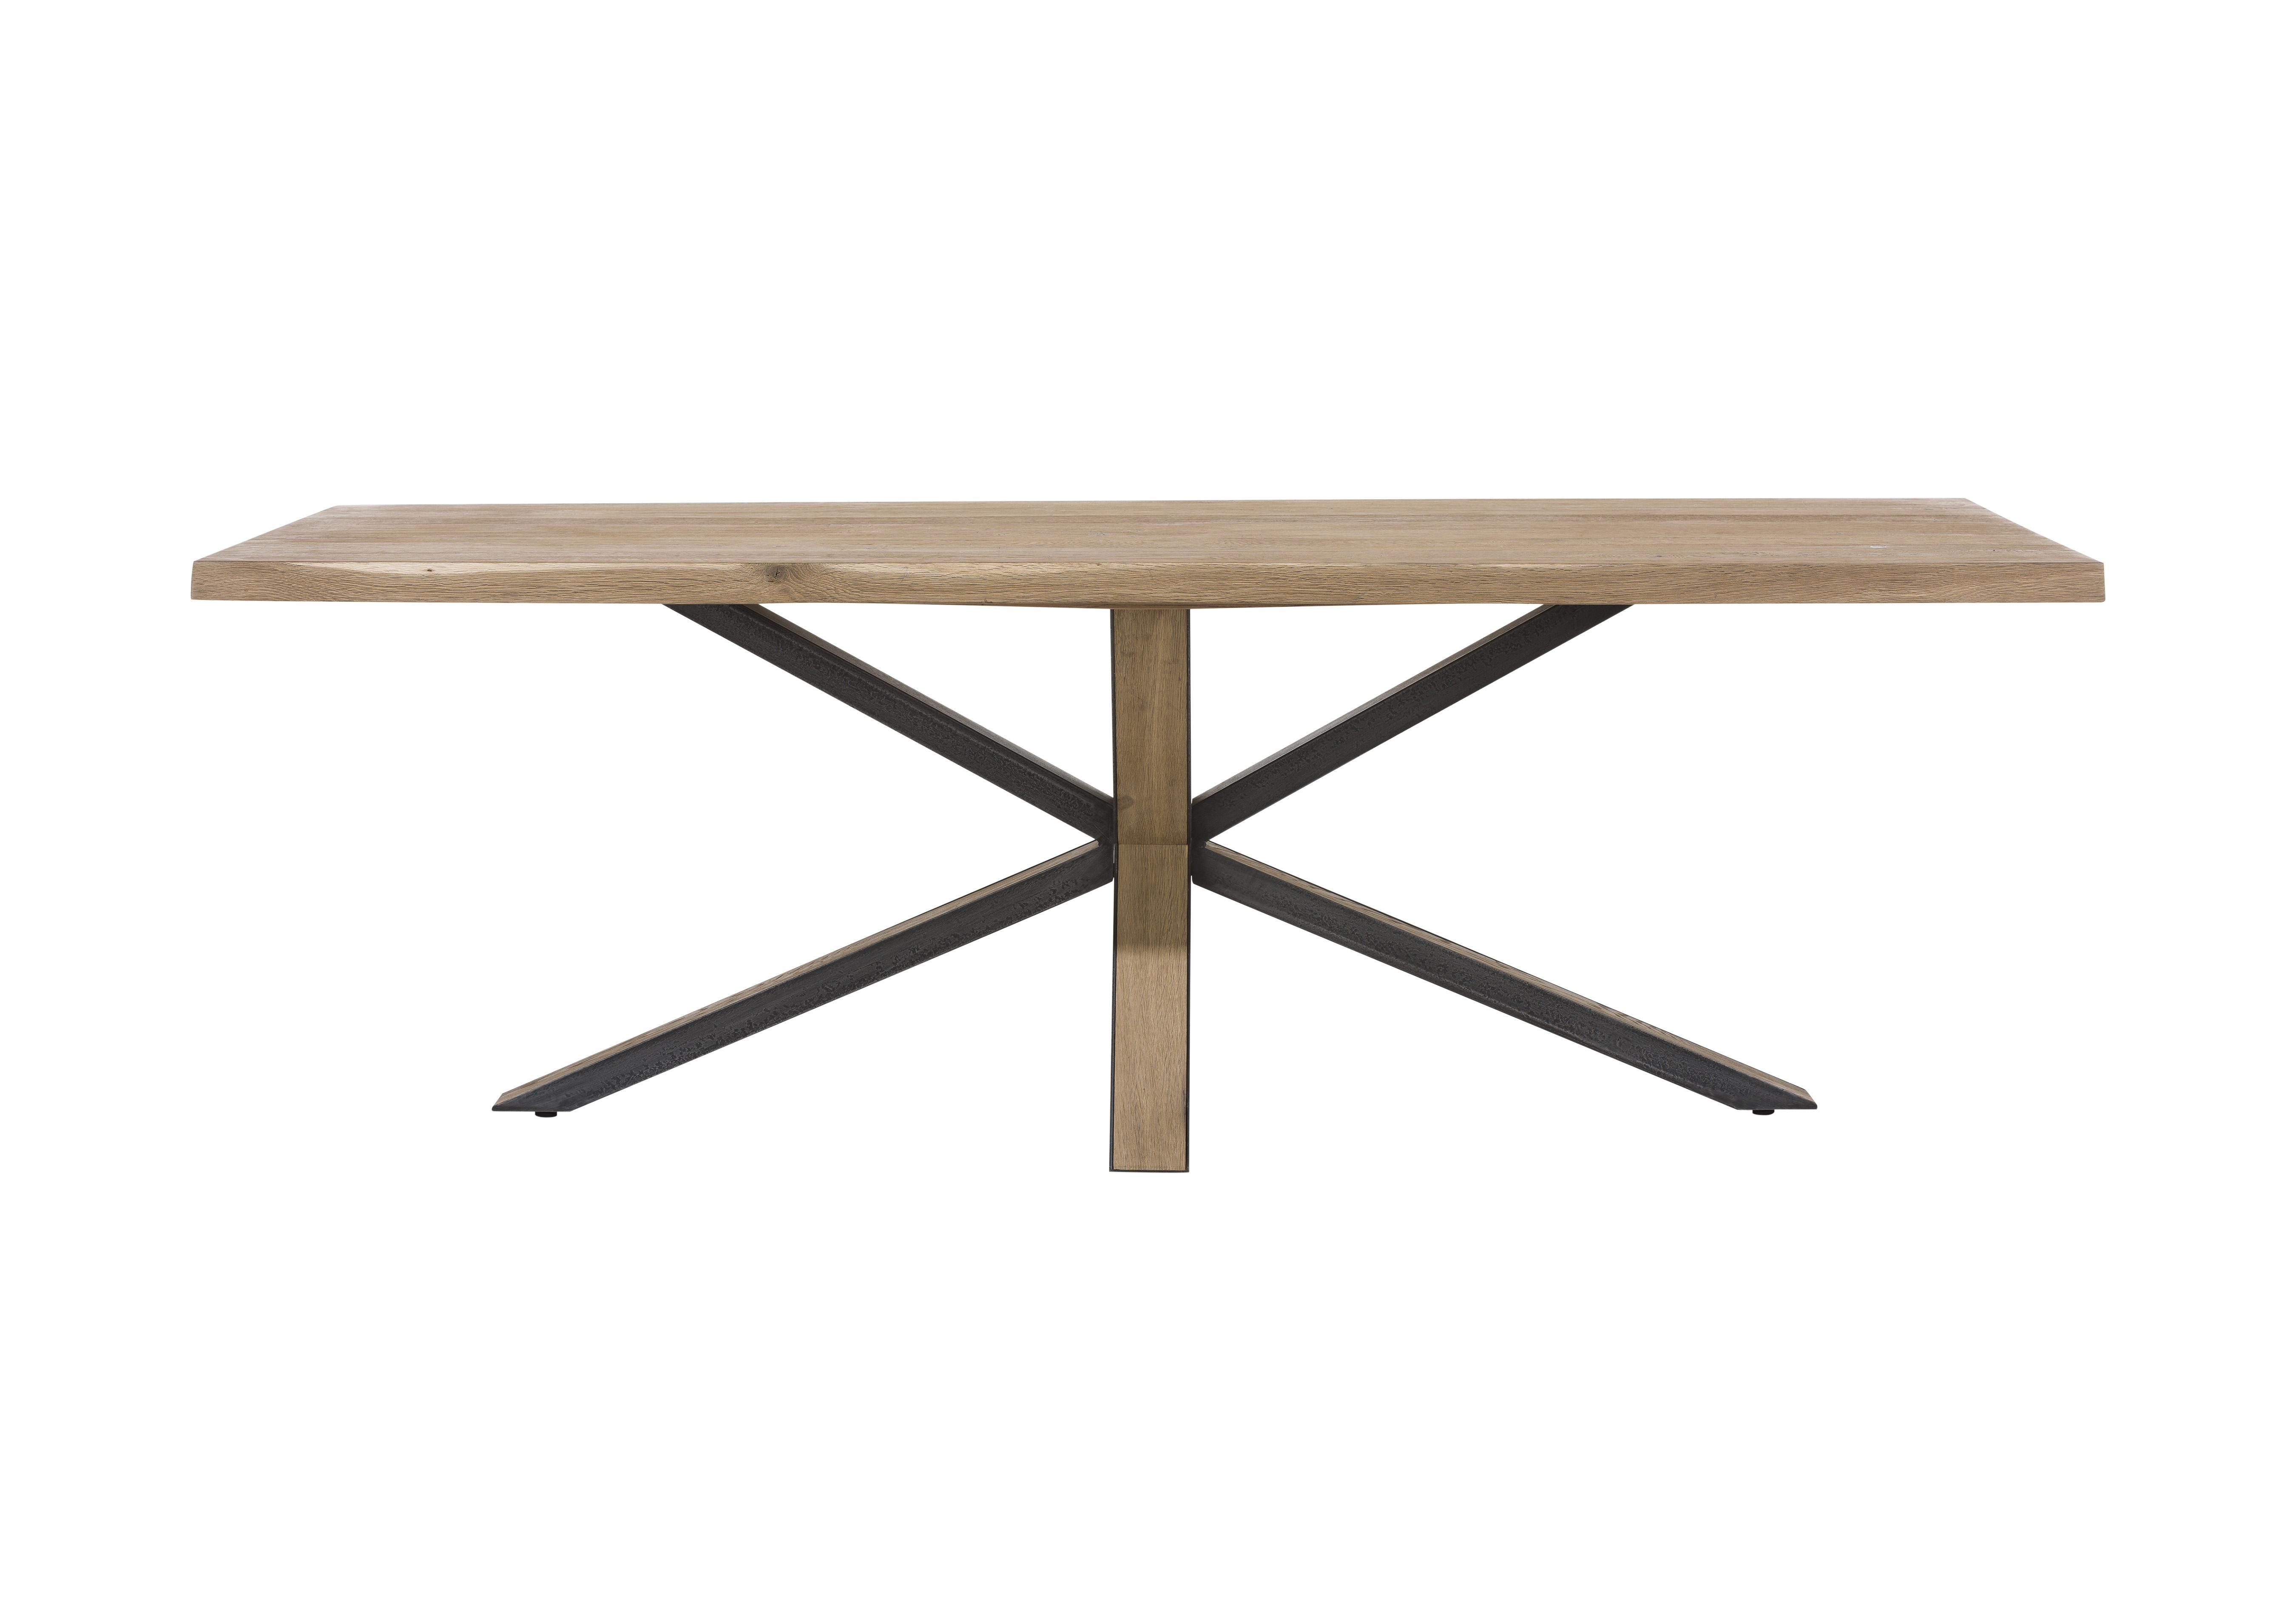 Habufa Detroit Starburst Leg Dining Table